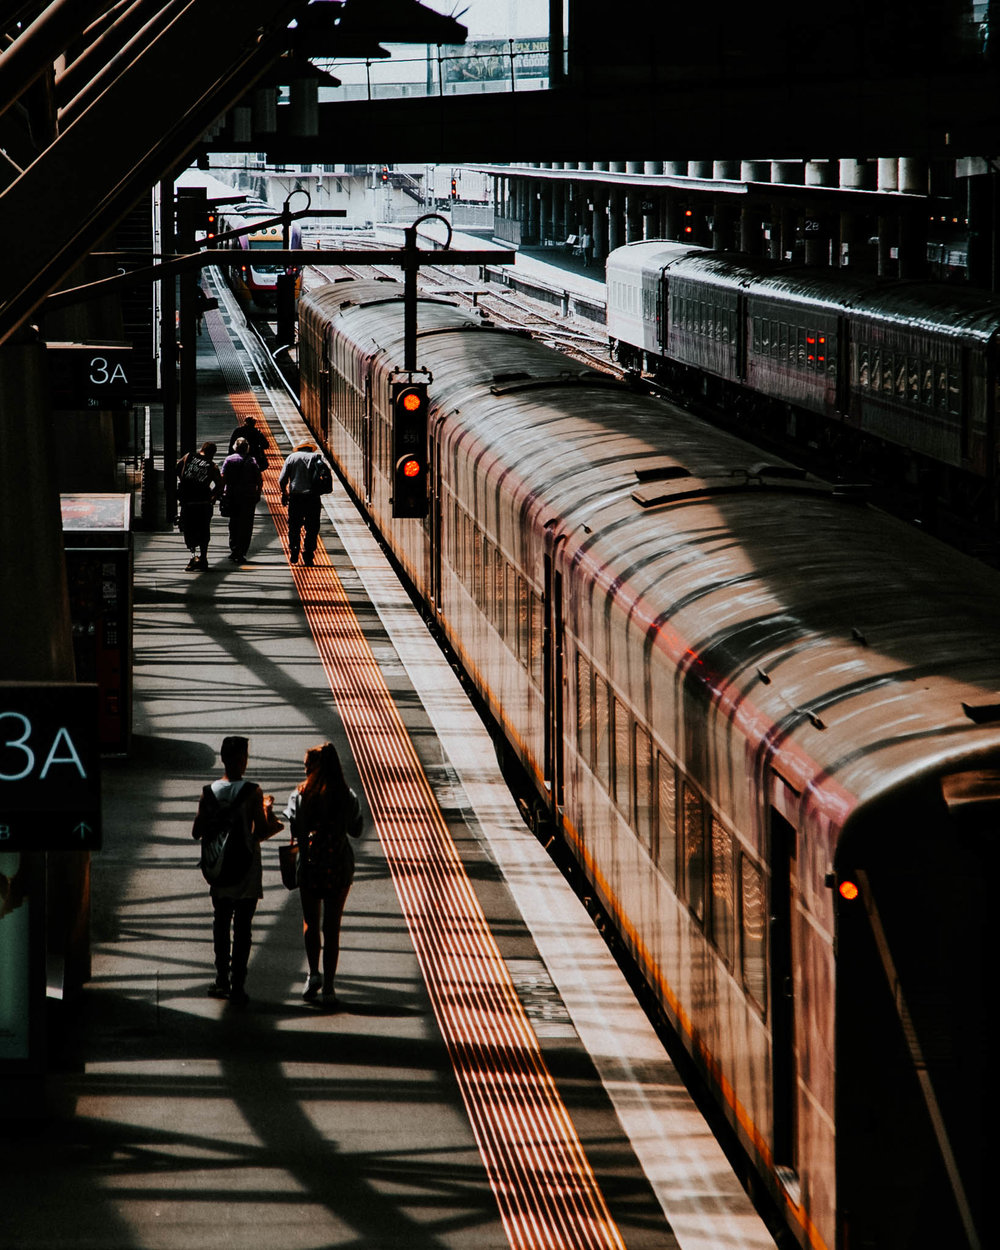 melbourne-trains-benjamin-andrew.jpg